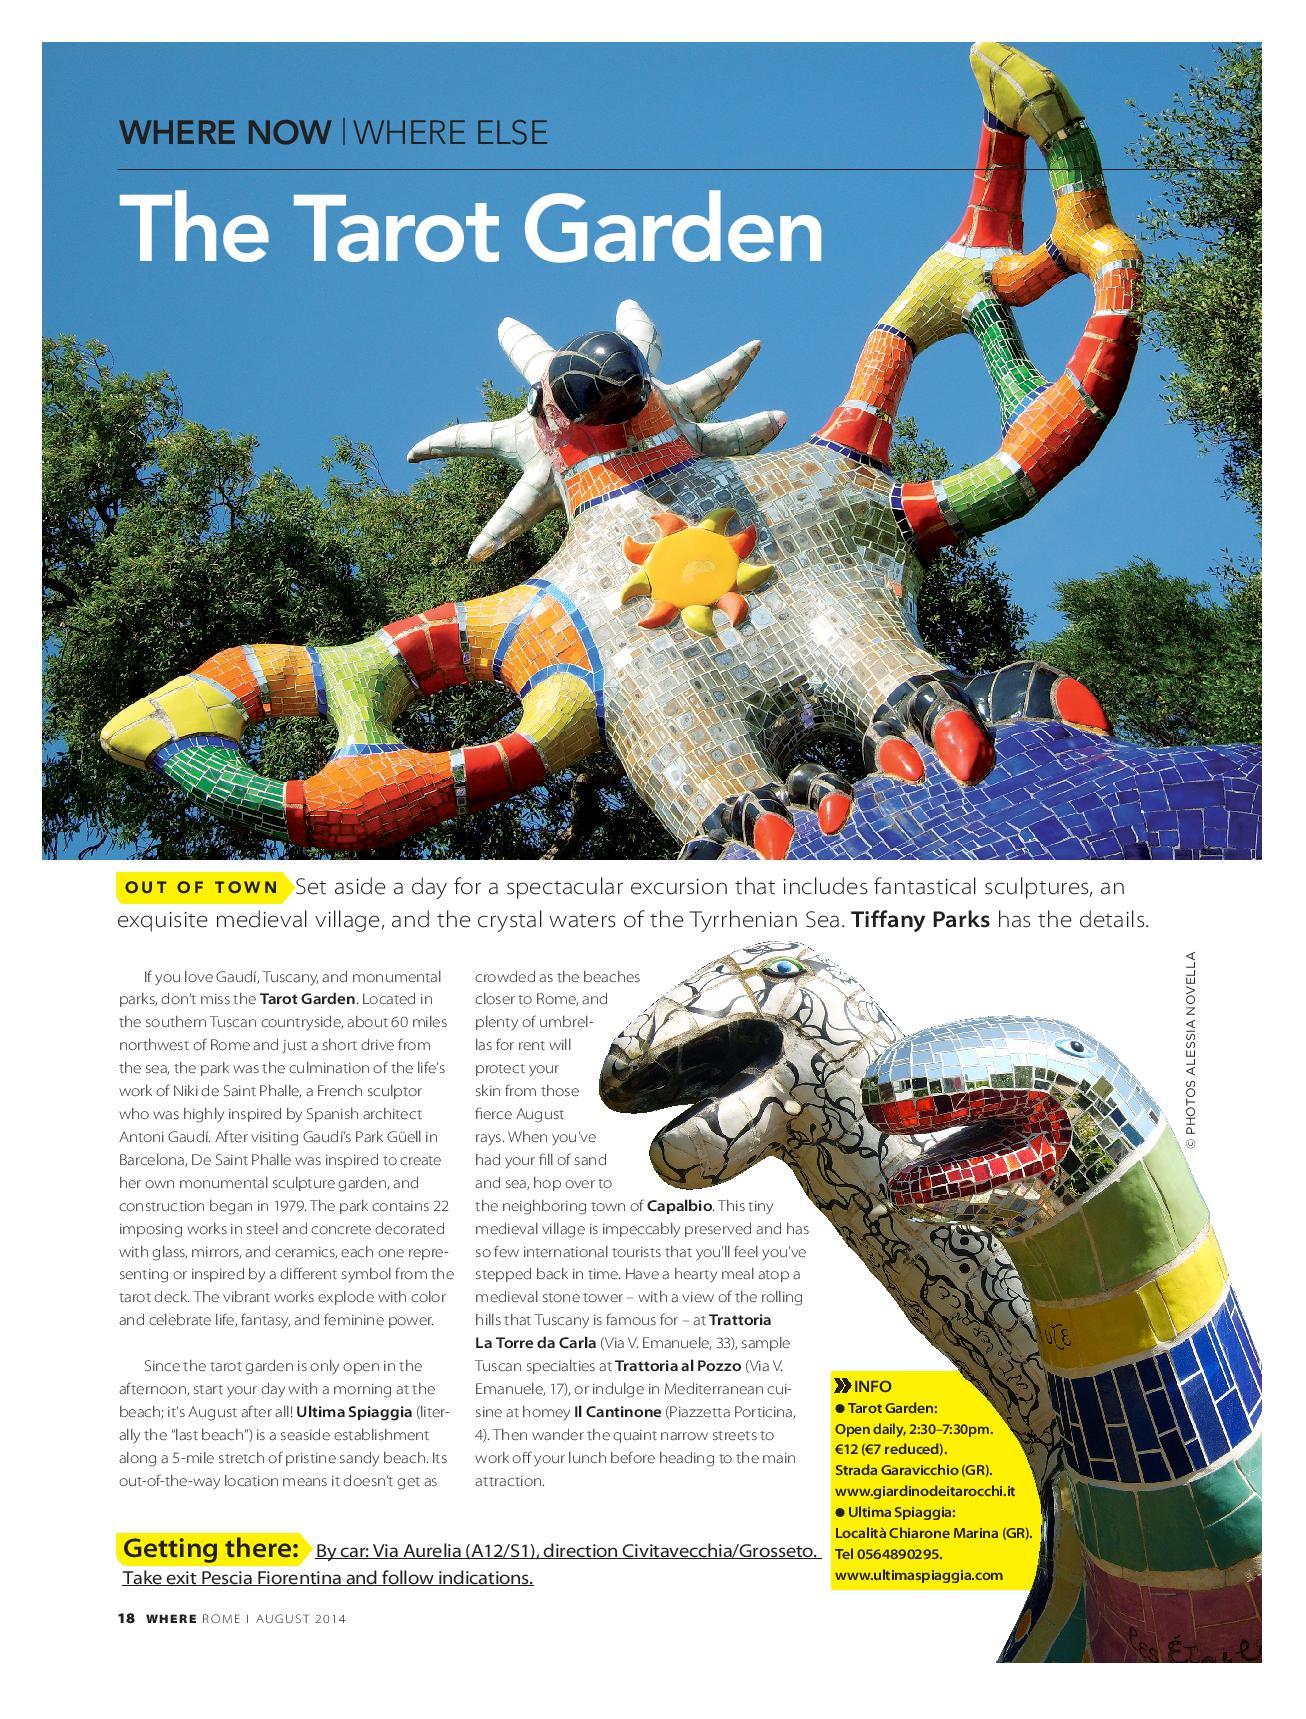 WhereElse - Tarot Garden, August 2014-page-001.jpg